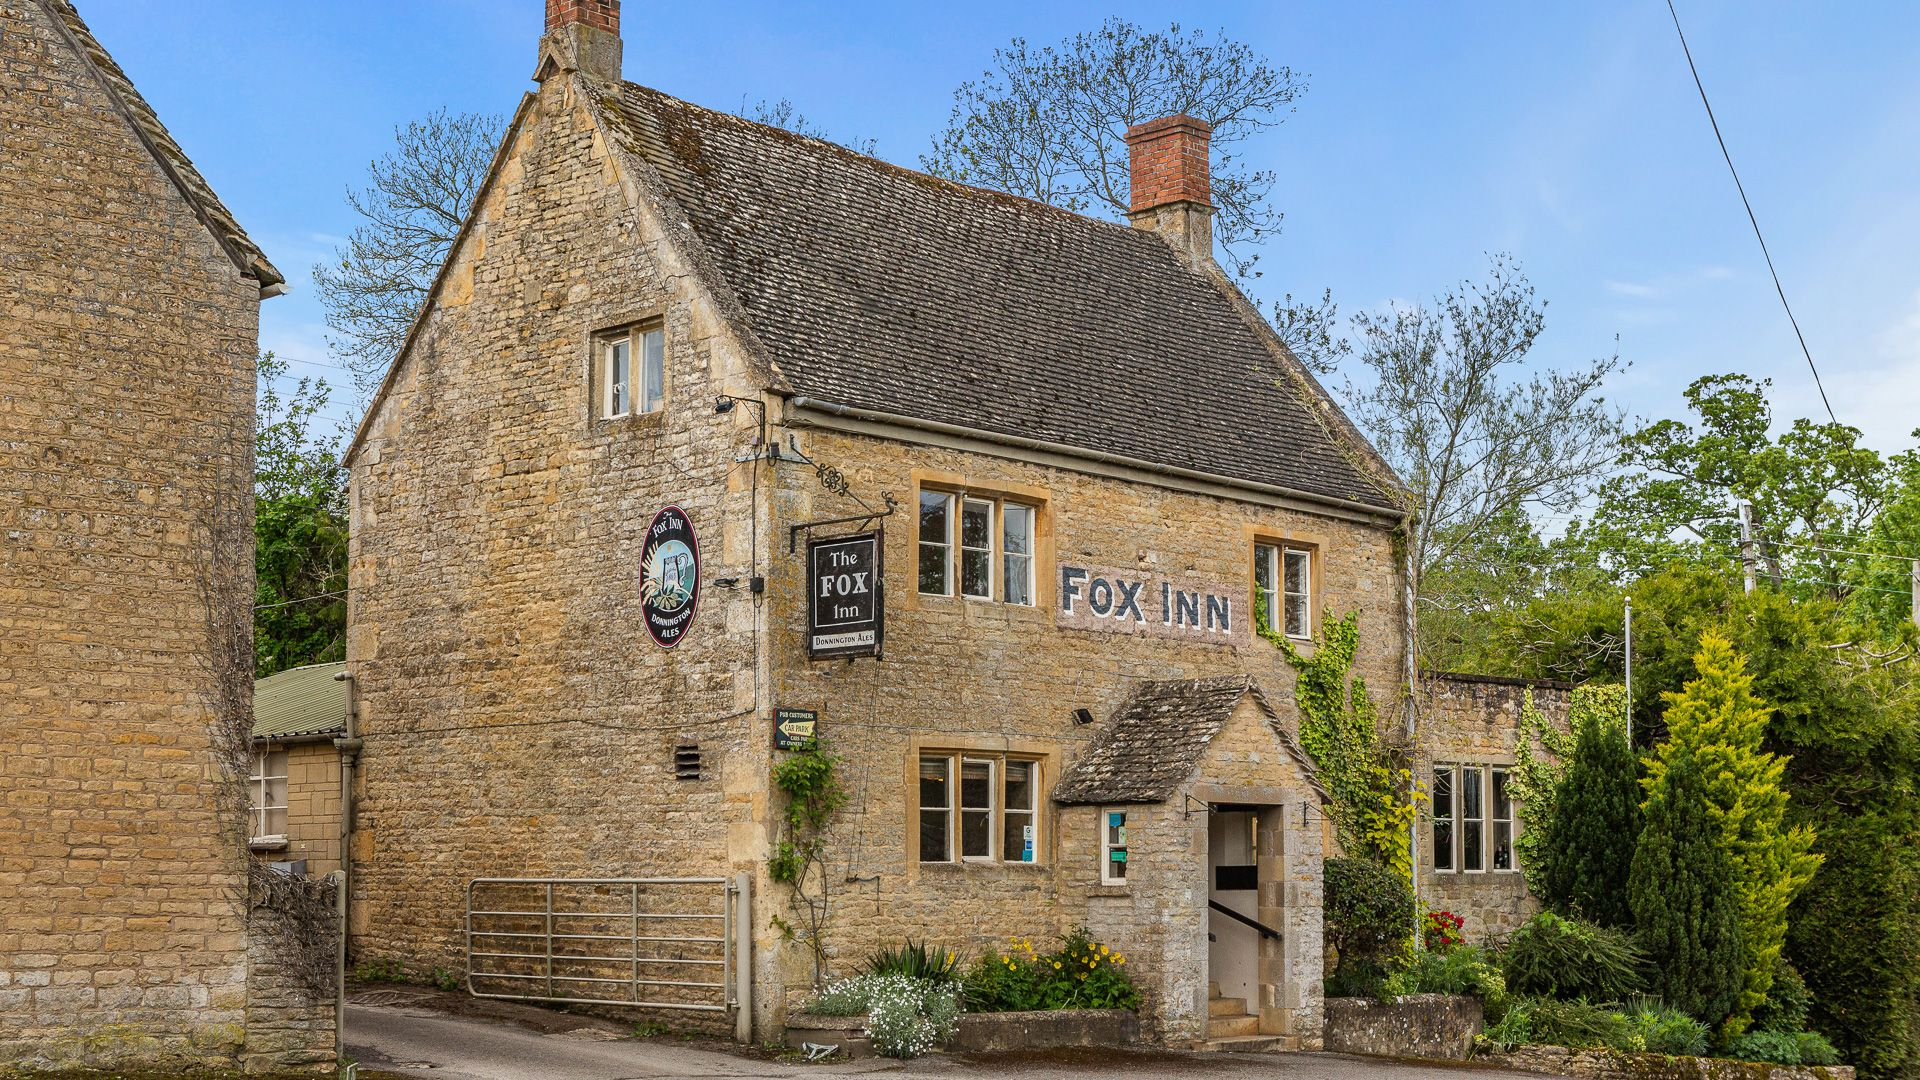 The Fox Inn at Broadwell, Poppy Cottage, Bolthole Retreats